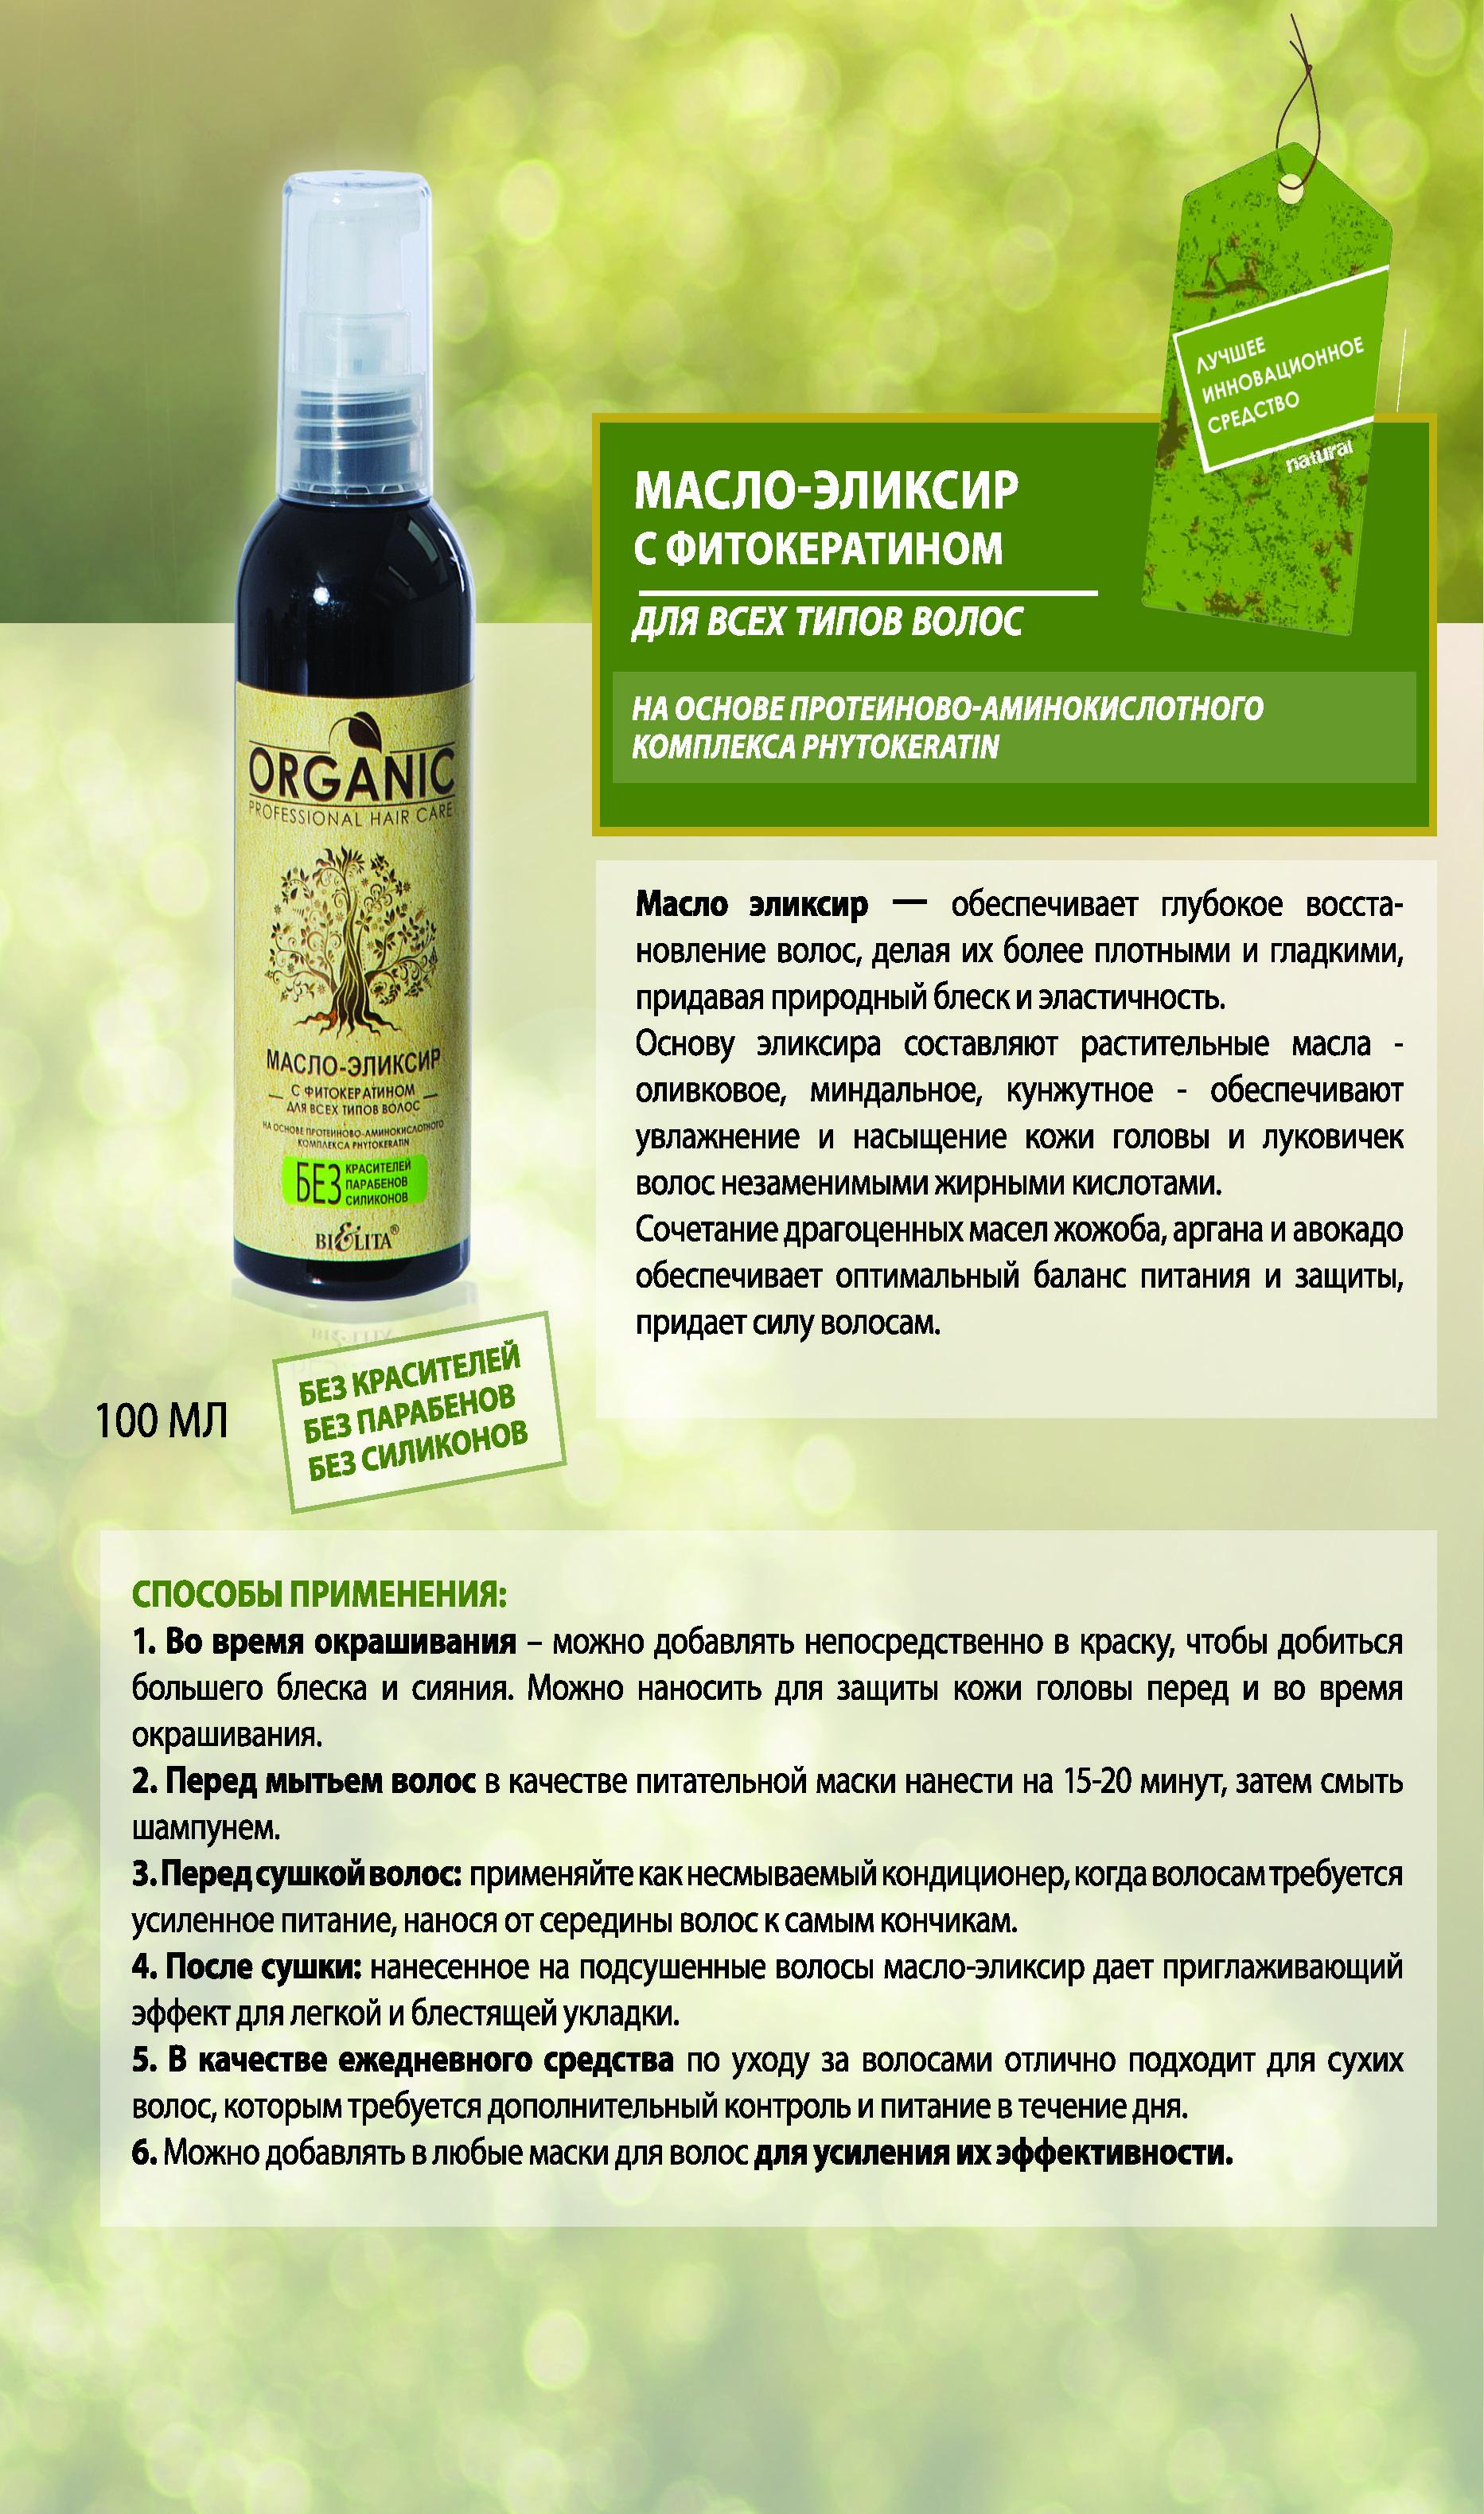 organic.pdf_Страница_7.jpg